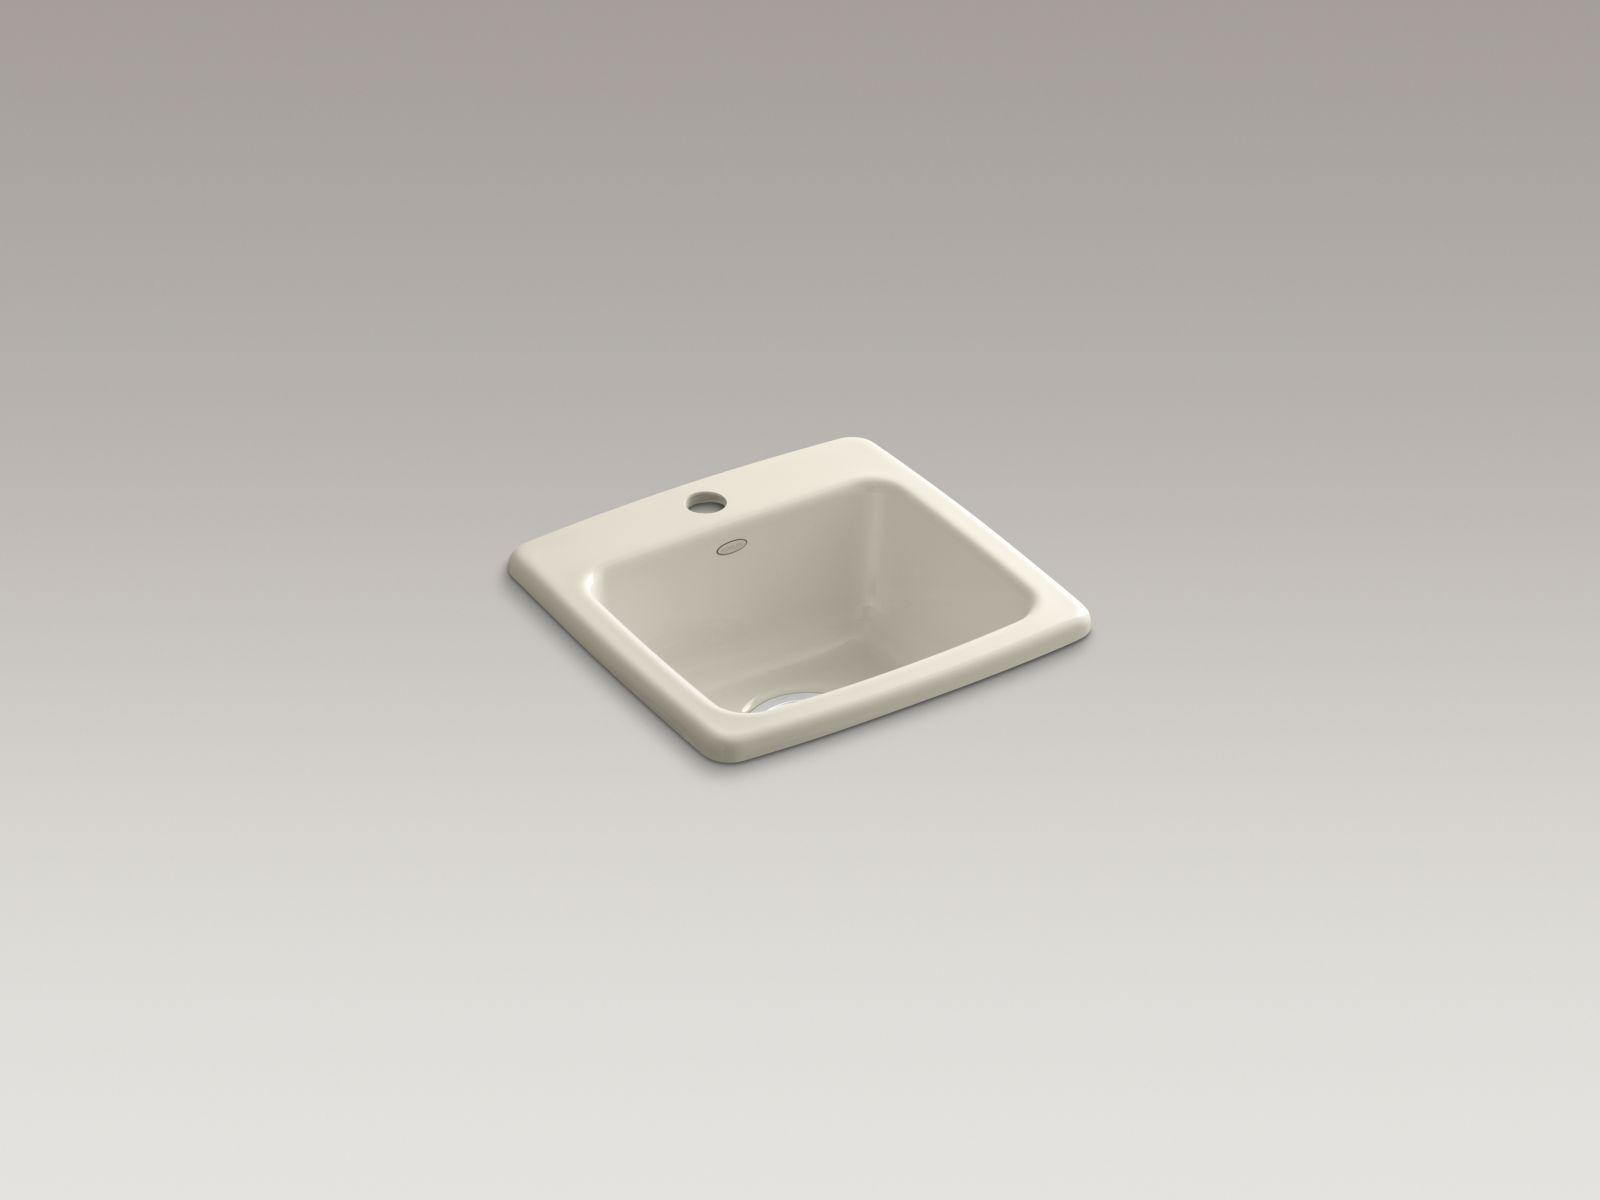 Kohler K-6015-1-47 Gimlet Self-rimming Single-bowl Bar Sink with Single Faucet Hole Almond